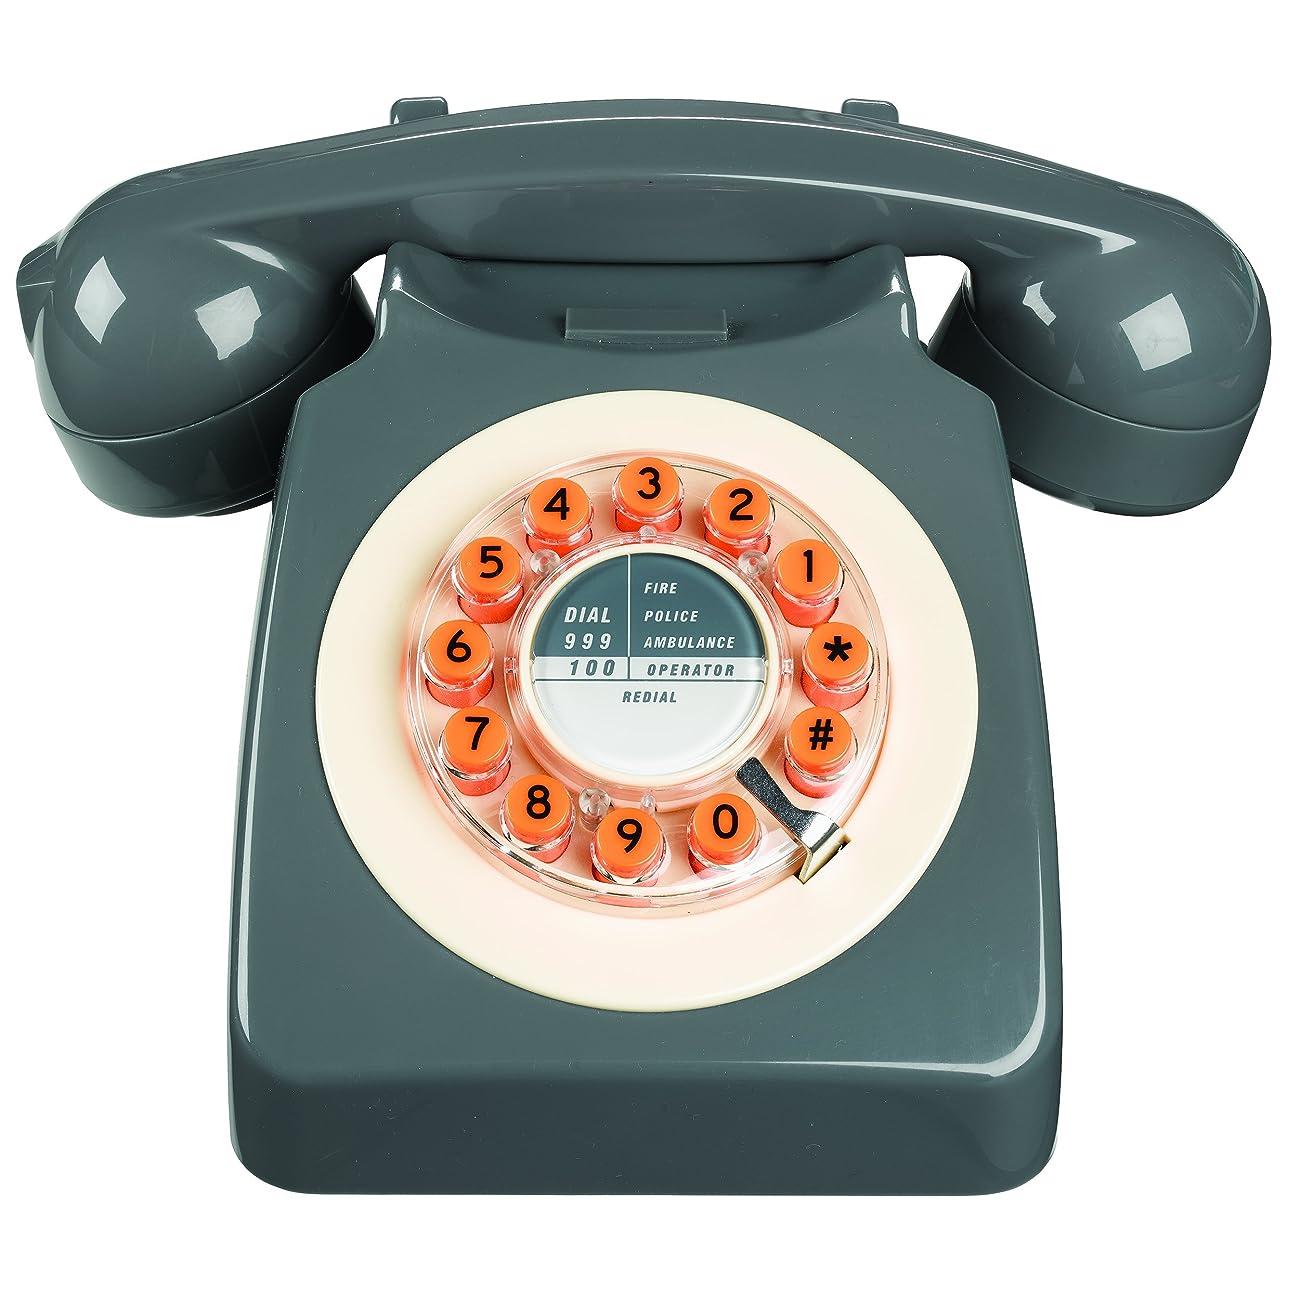 746 Phone Retro Design - Concrete Grey 0